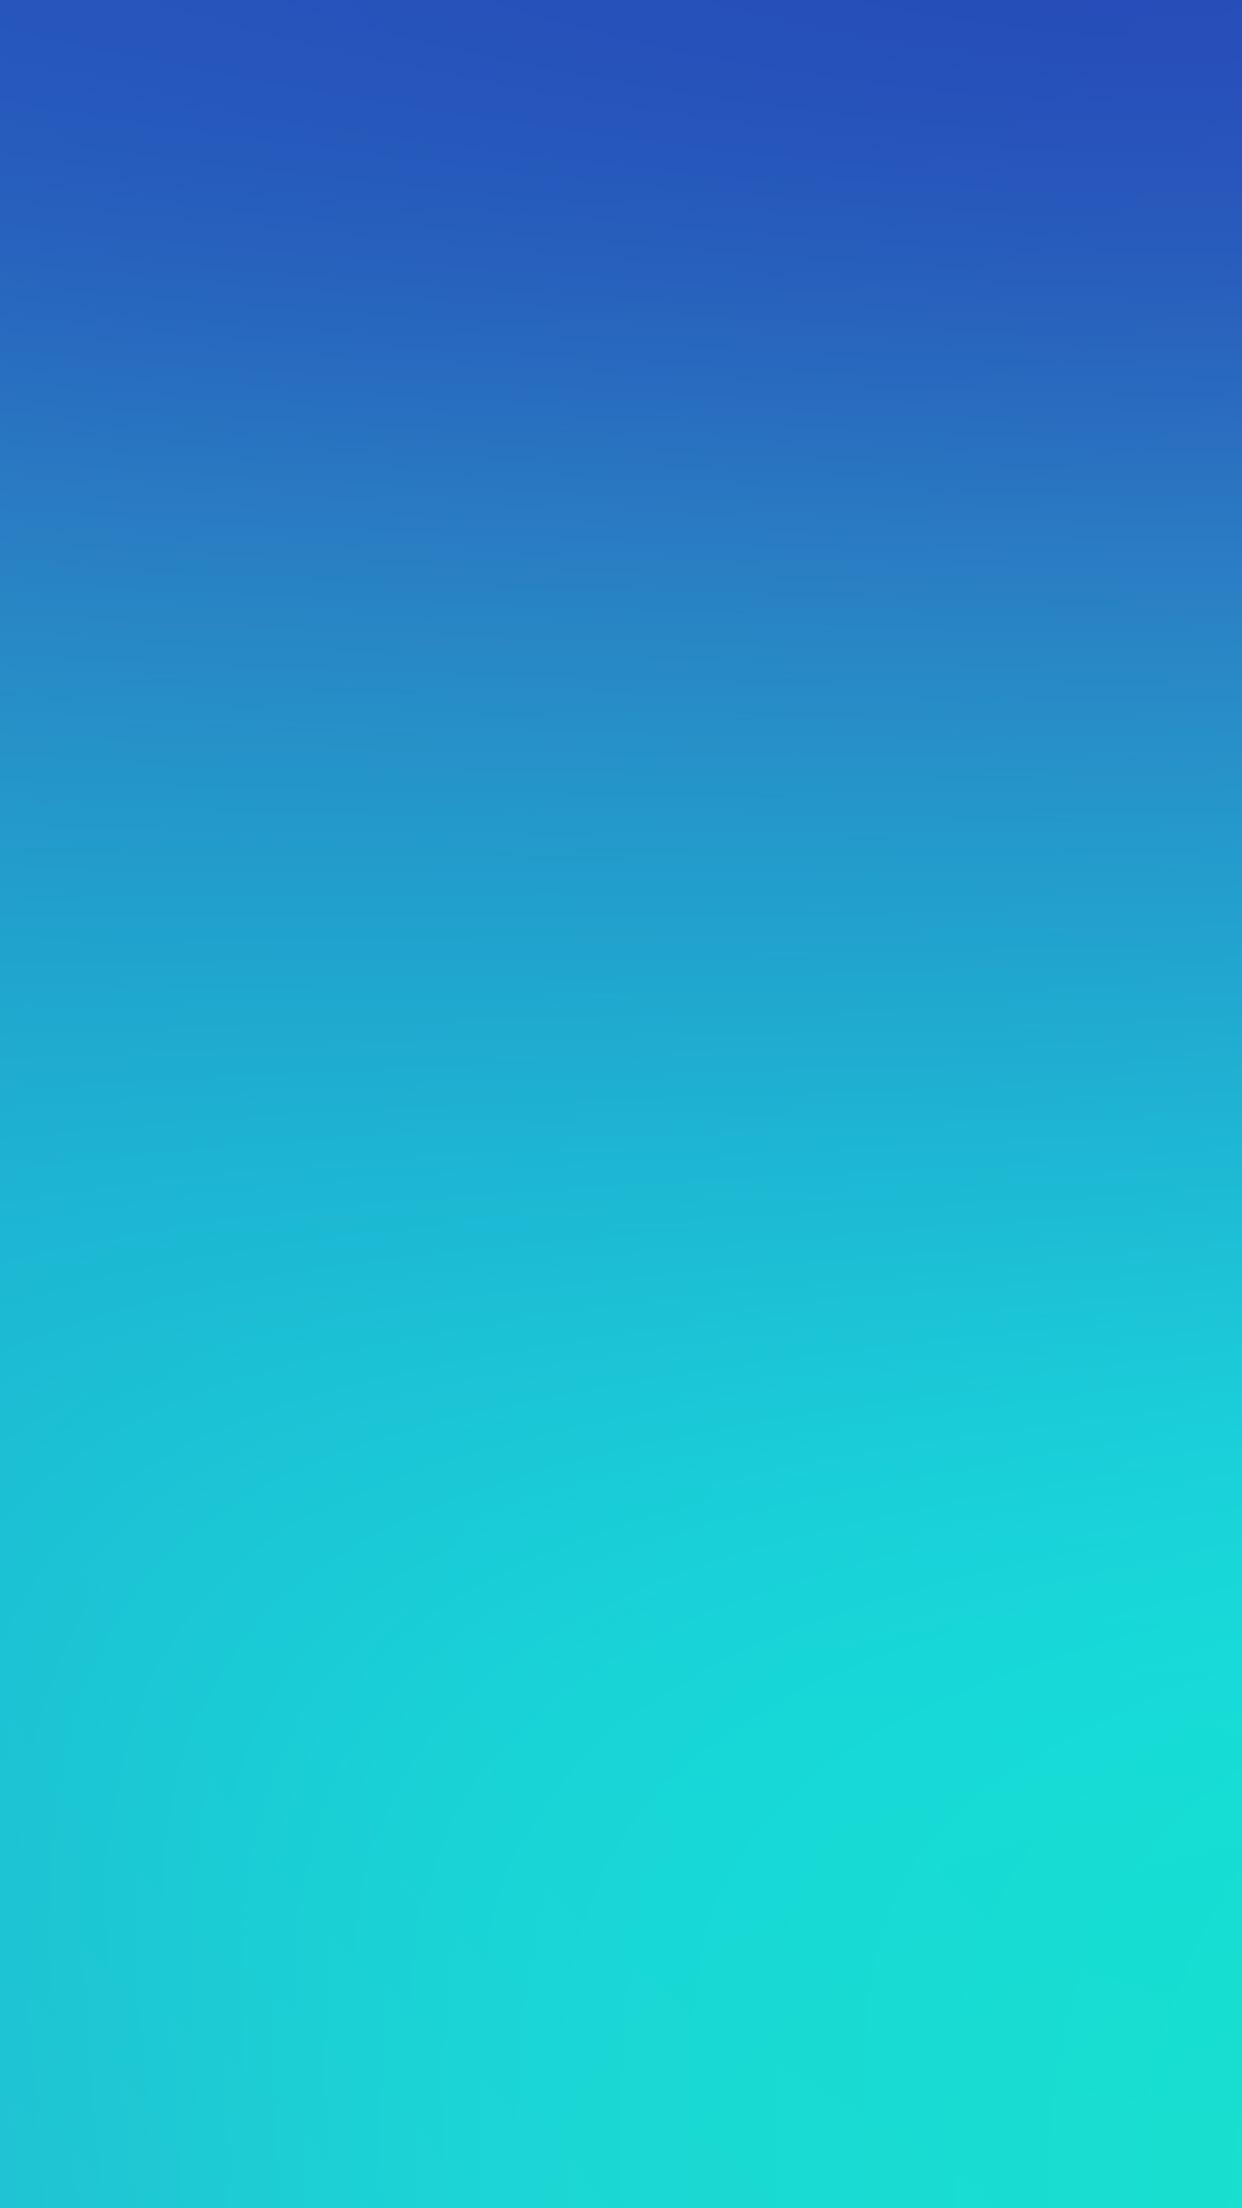 Cute Hd Wallpapers For Phone Si49 Blue Sky Blue Gradation Blur Wallpaper